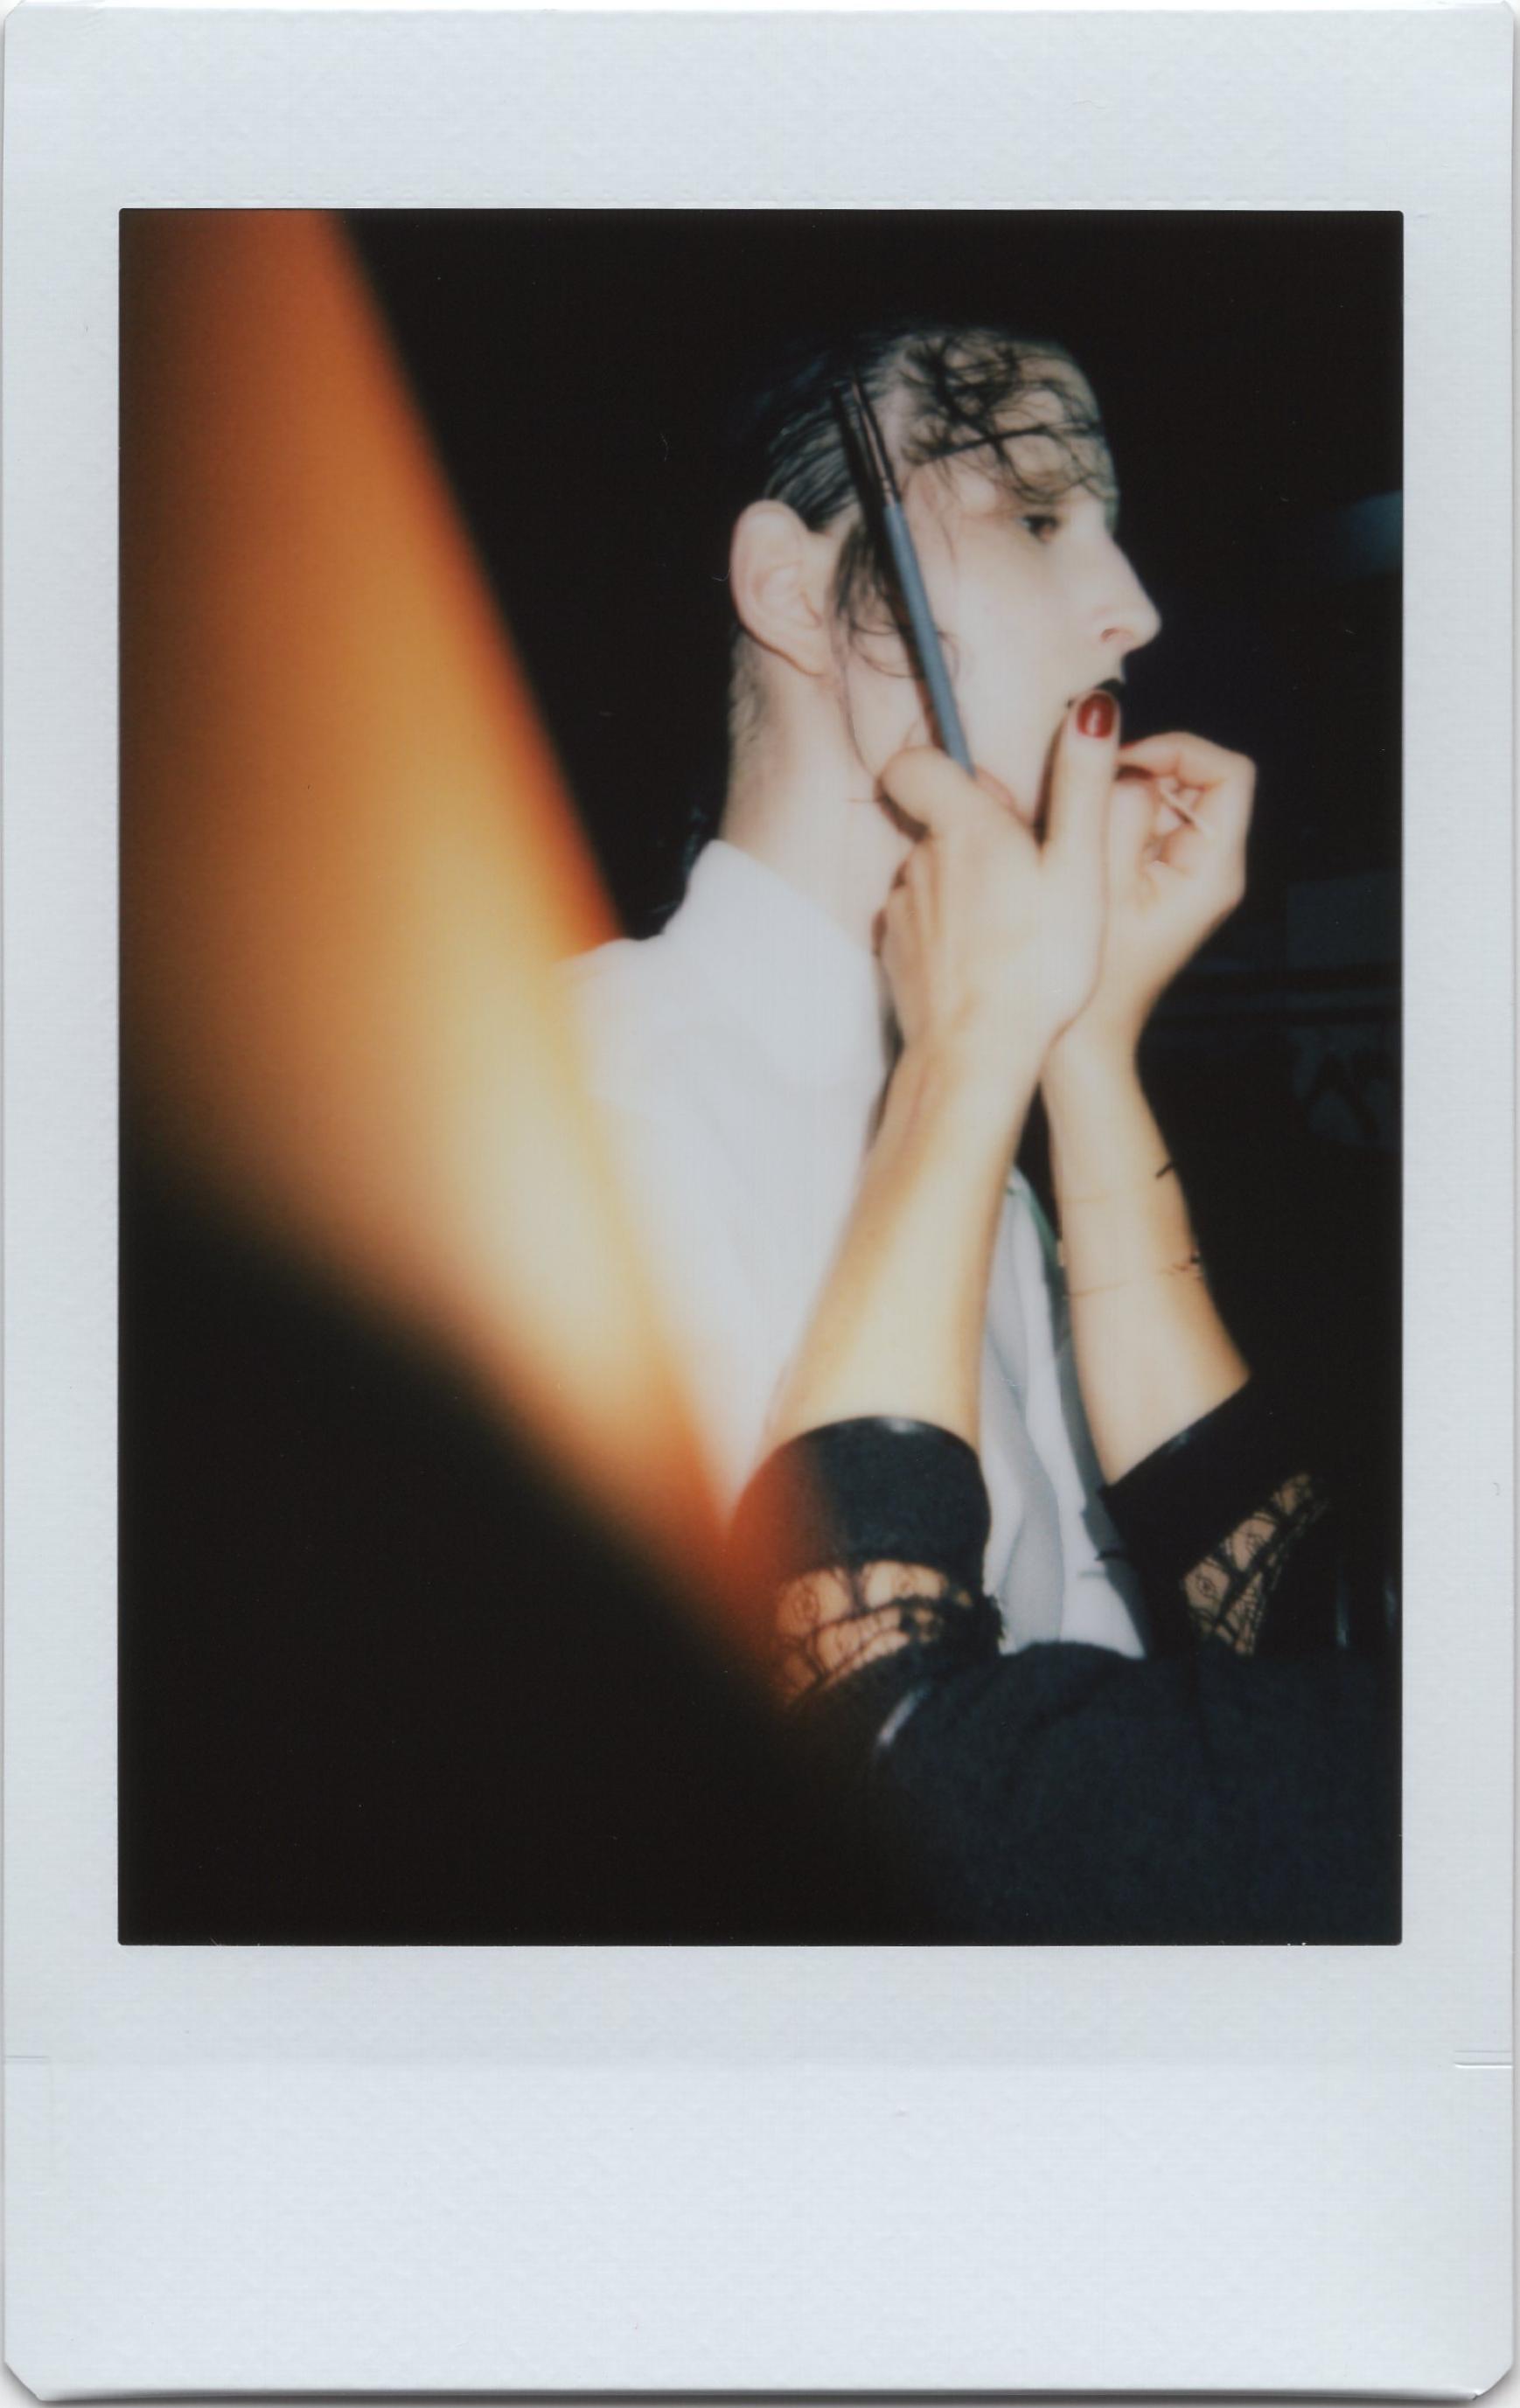 YangLi_Honigschreck_Backstage_polaroid_6.jpg